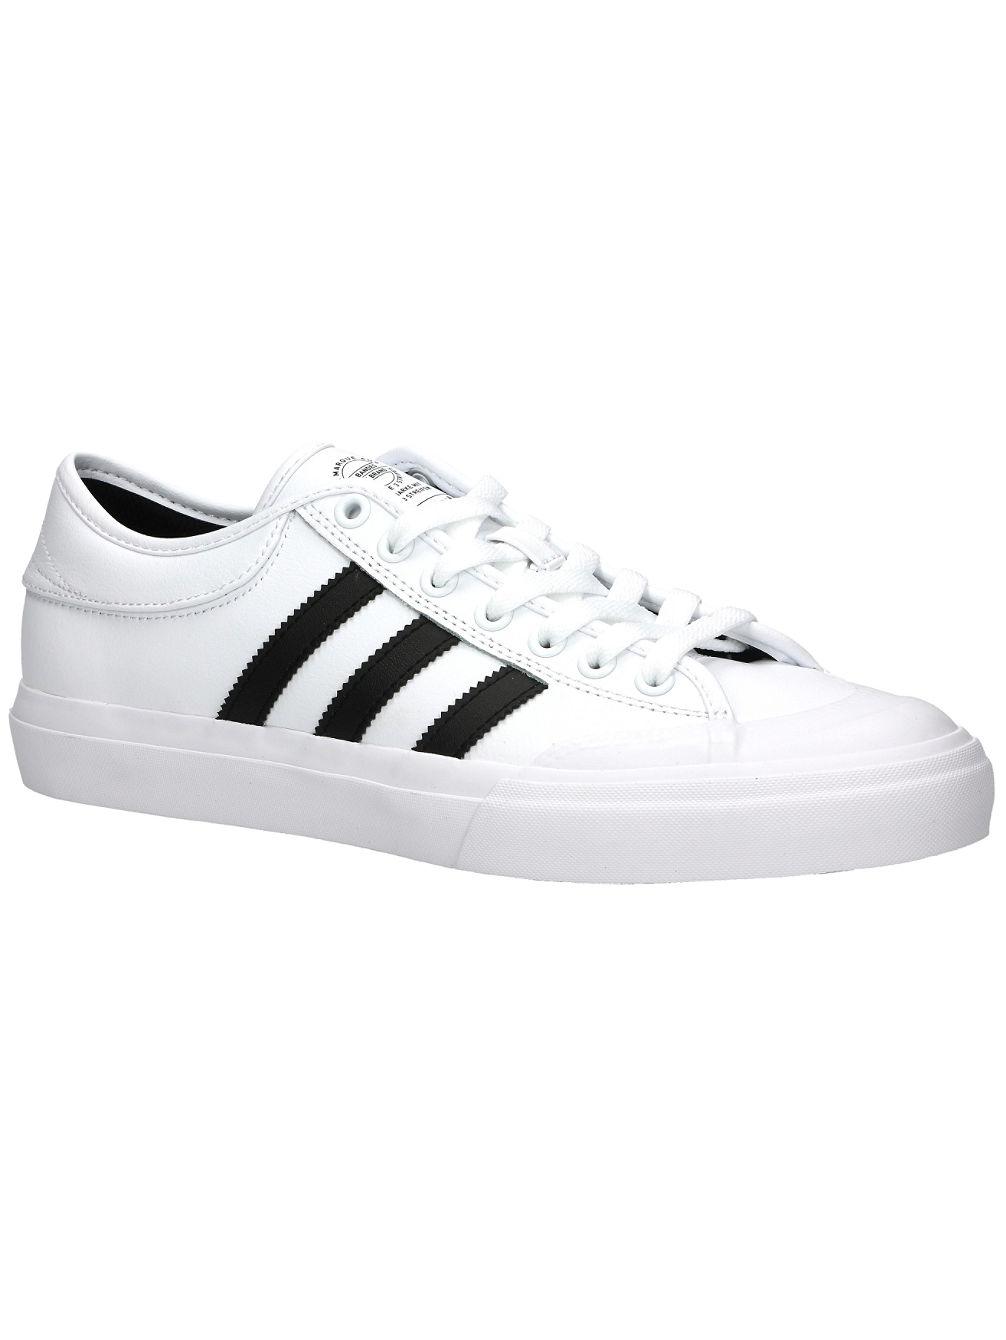 adidas-skateboarding-matchcourt-skate-shoes